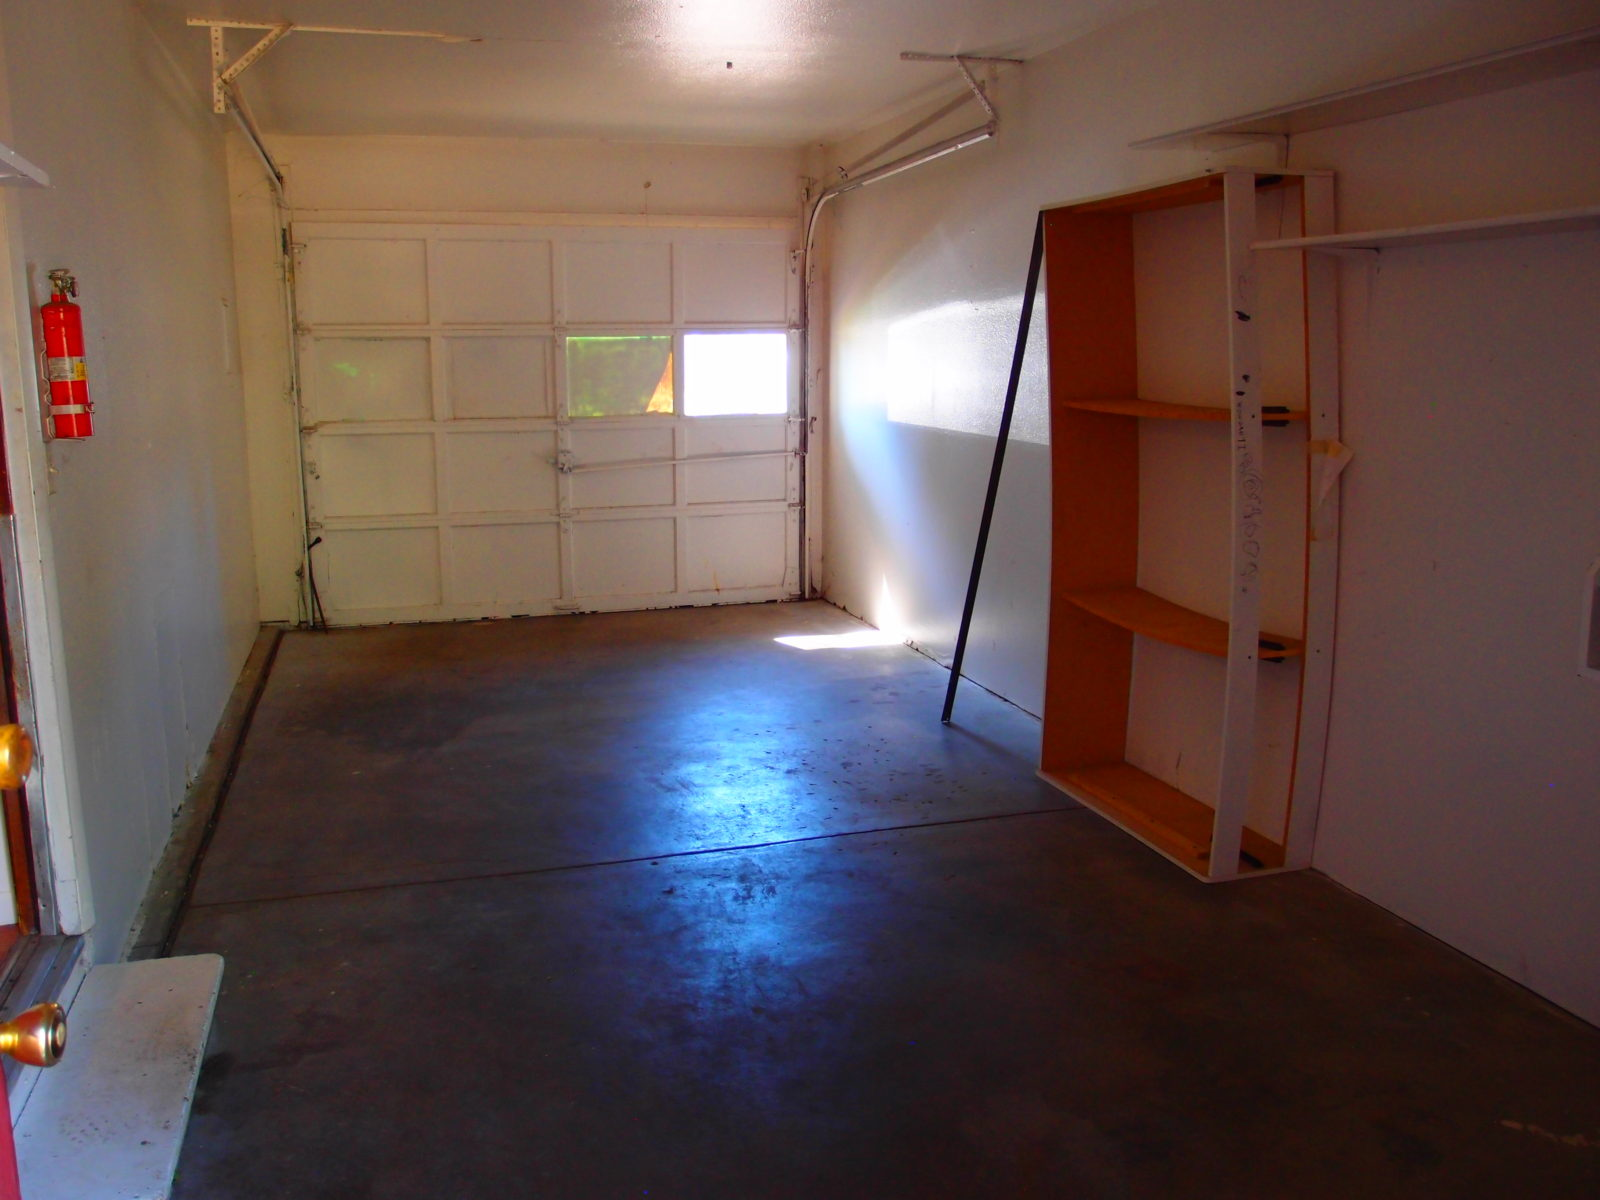 2166 Dexter: Single Car Garage 2